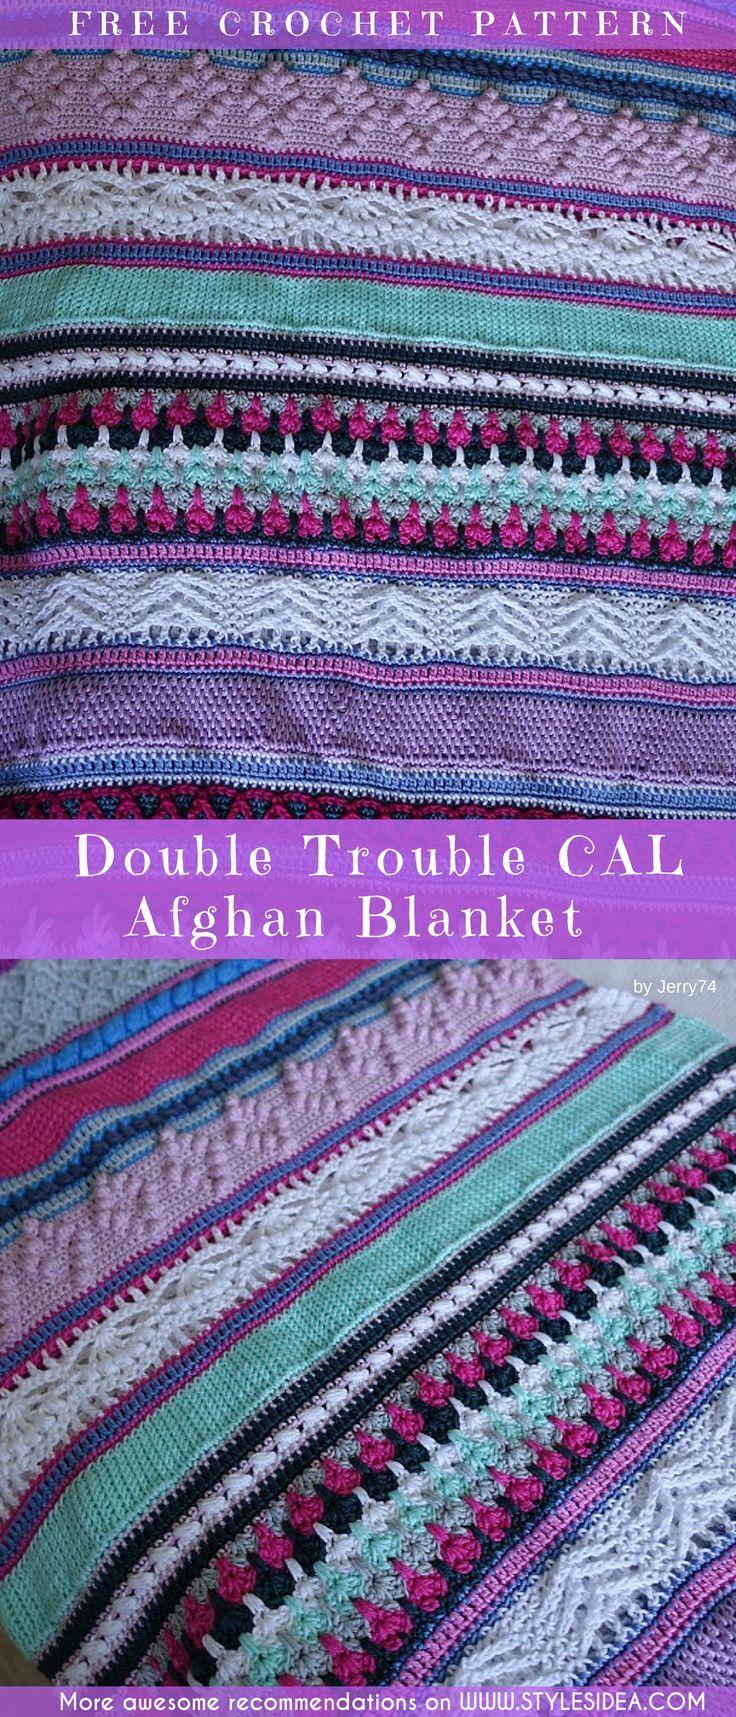 Double Trouble CAL Afghan Blanket Free Crochet Pattern | Pinterest ...